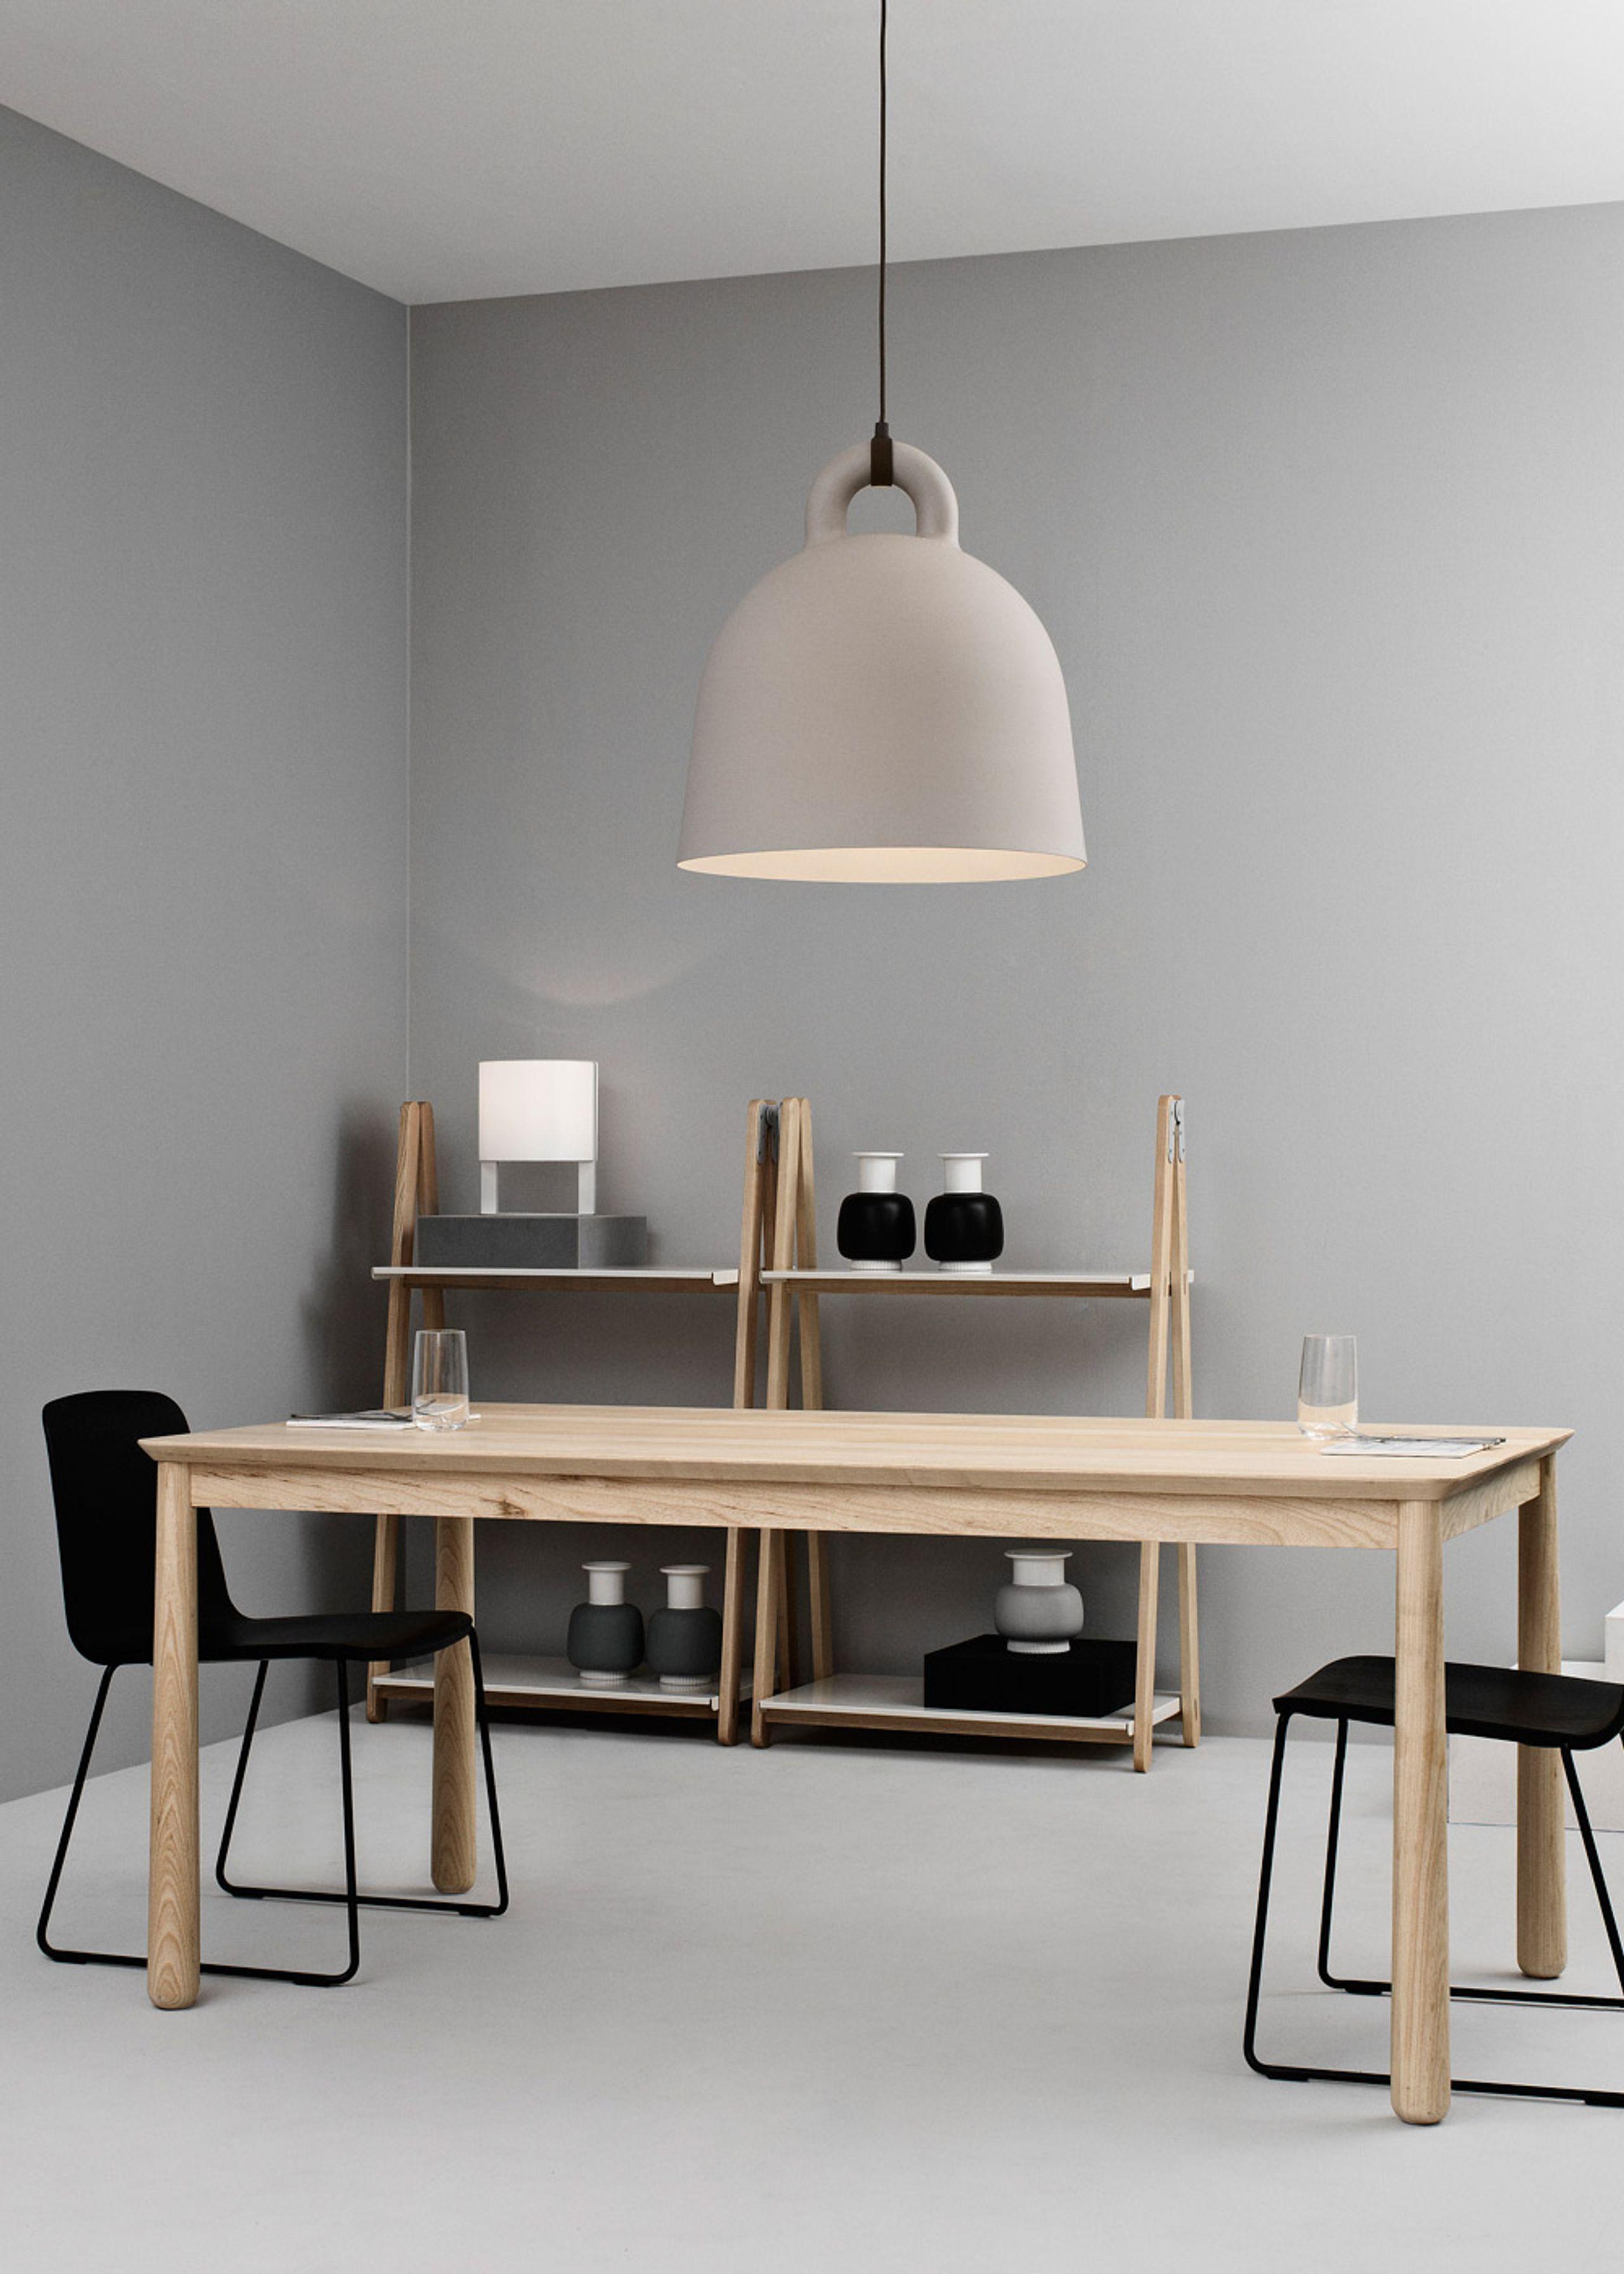 Normann Copenhagen Lampe : bell lampe normann copenhagen ~ Watch28wear.com Haus und Dekorationen